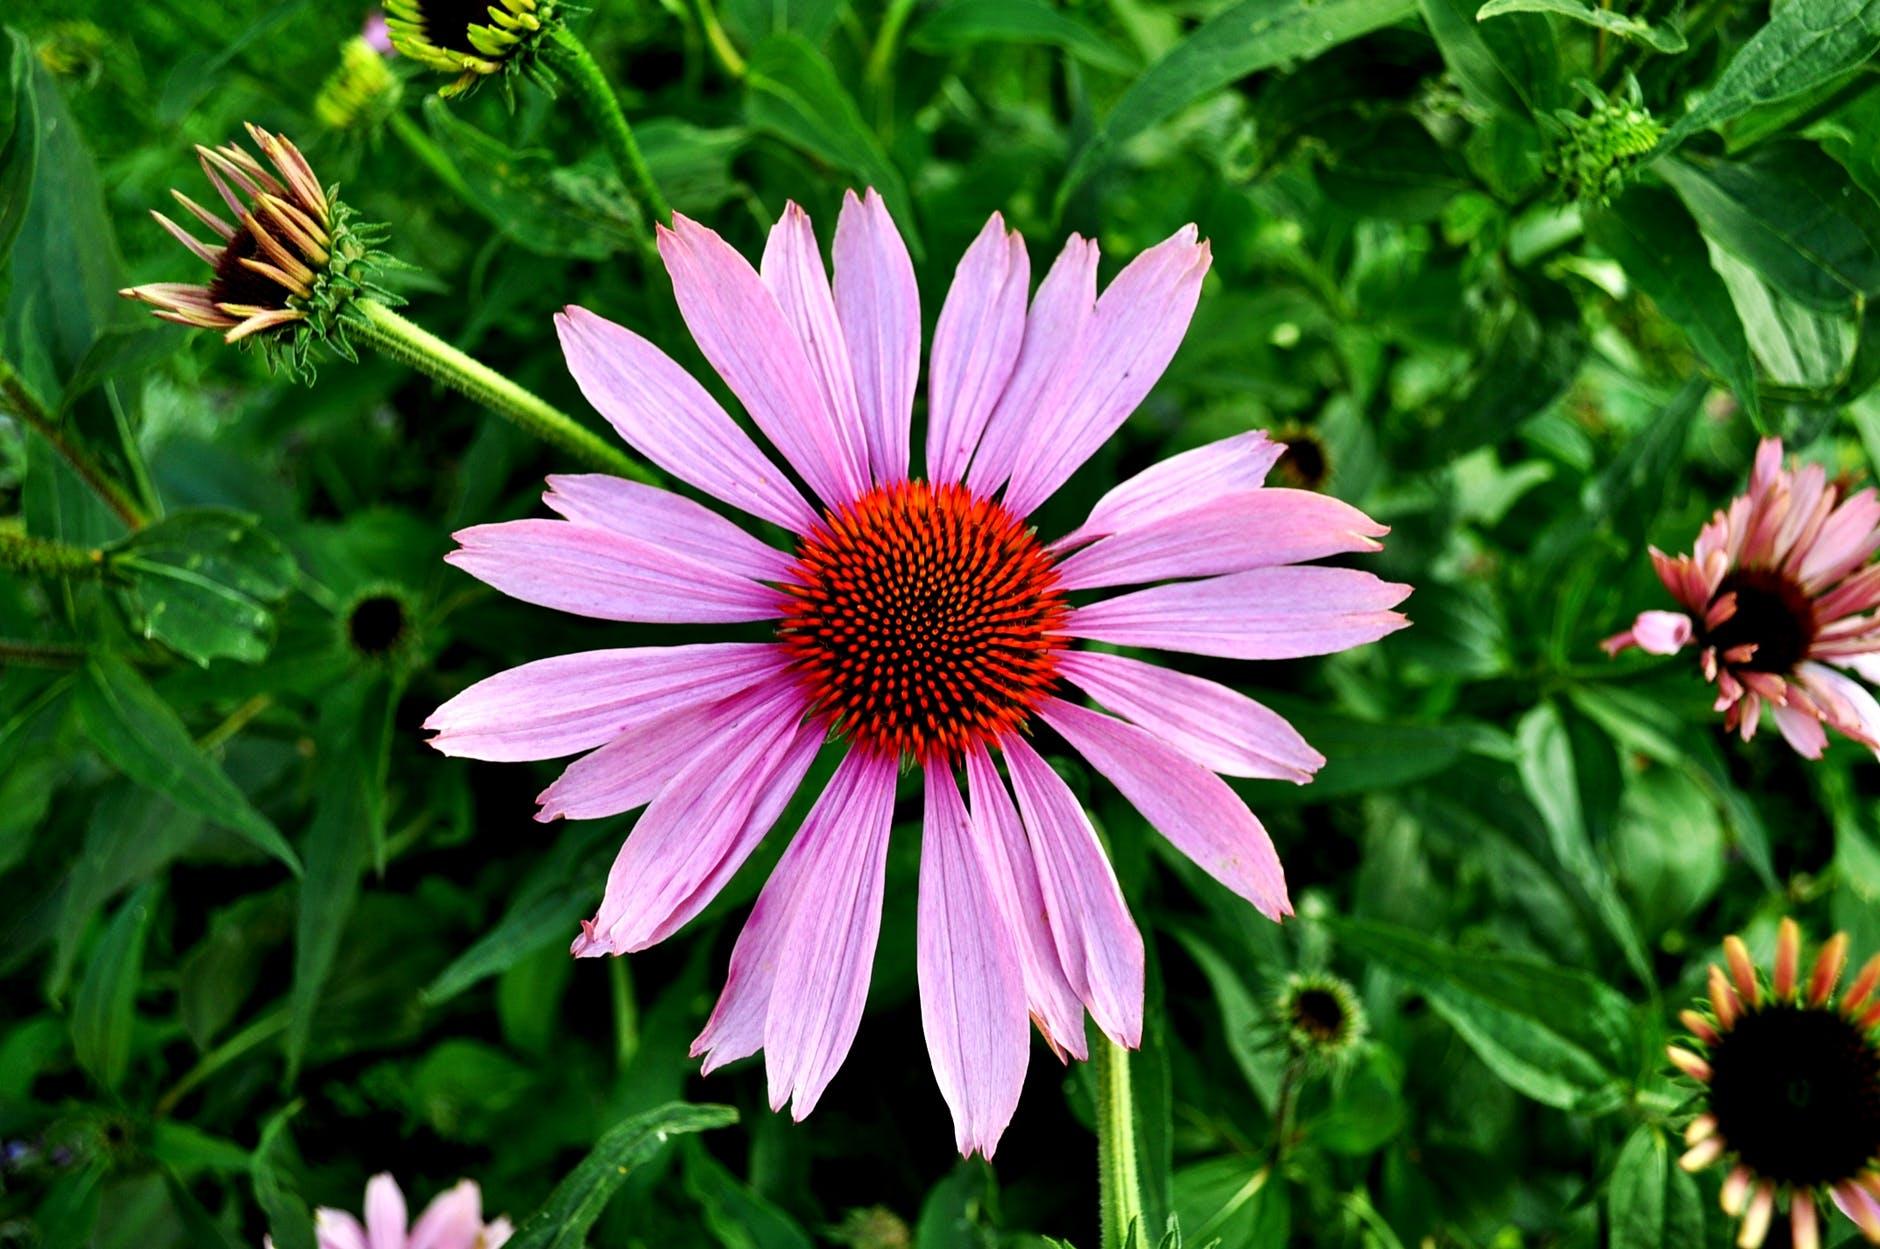 flowers garden plant pink